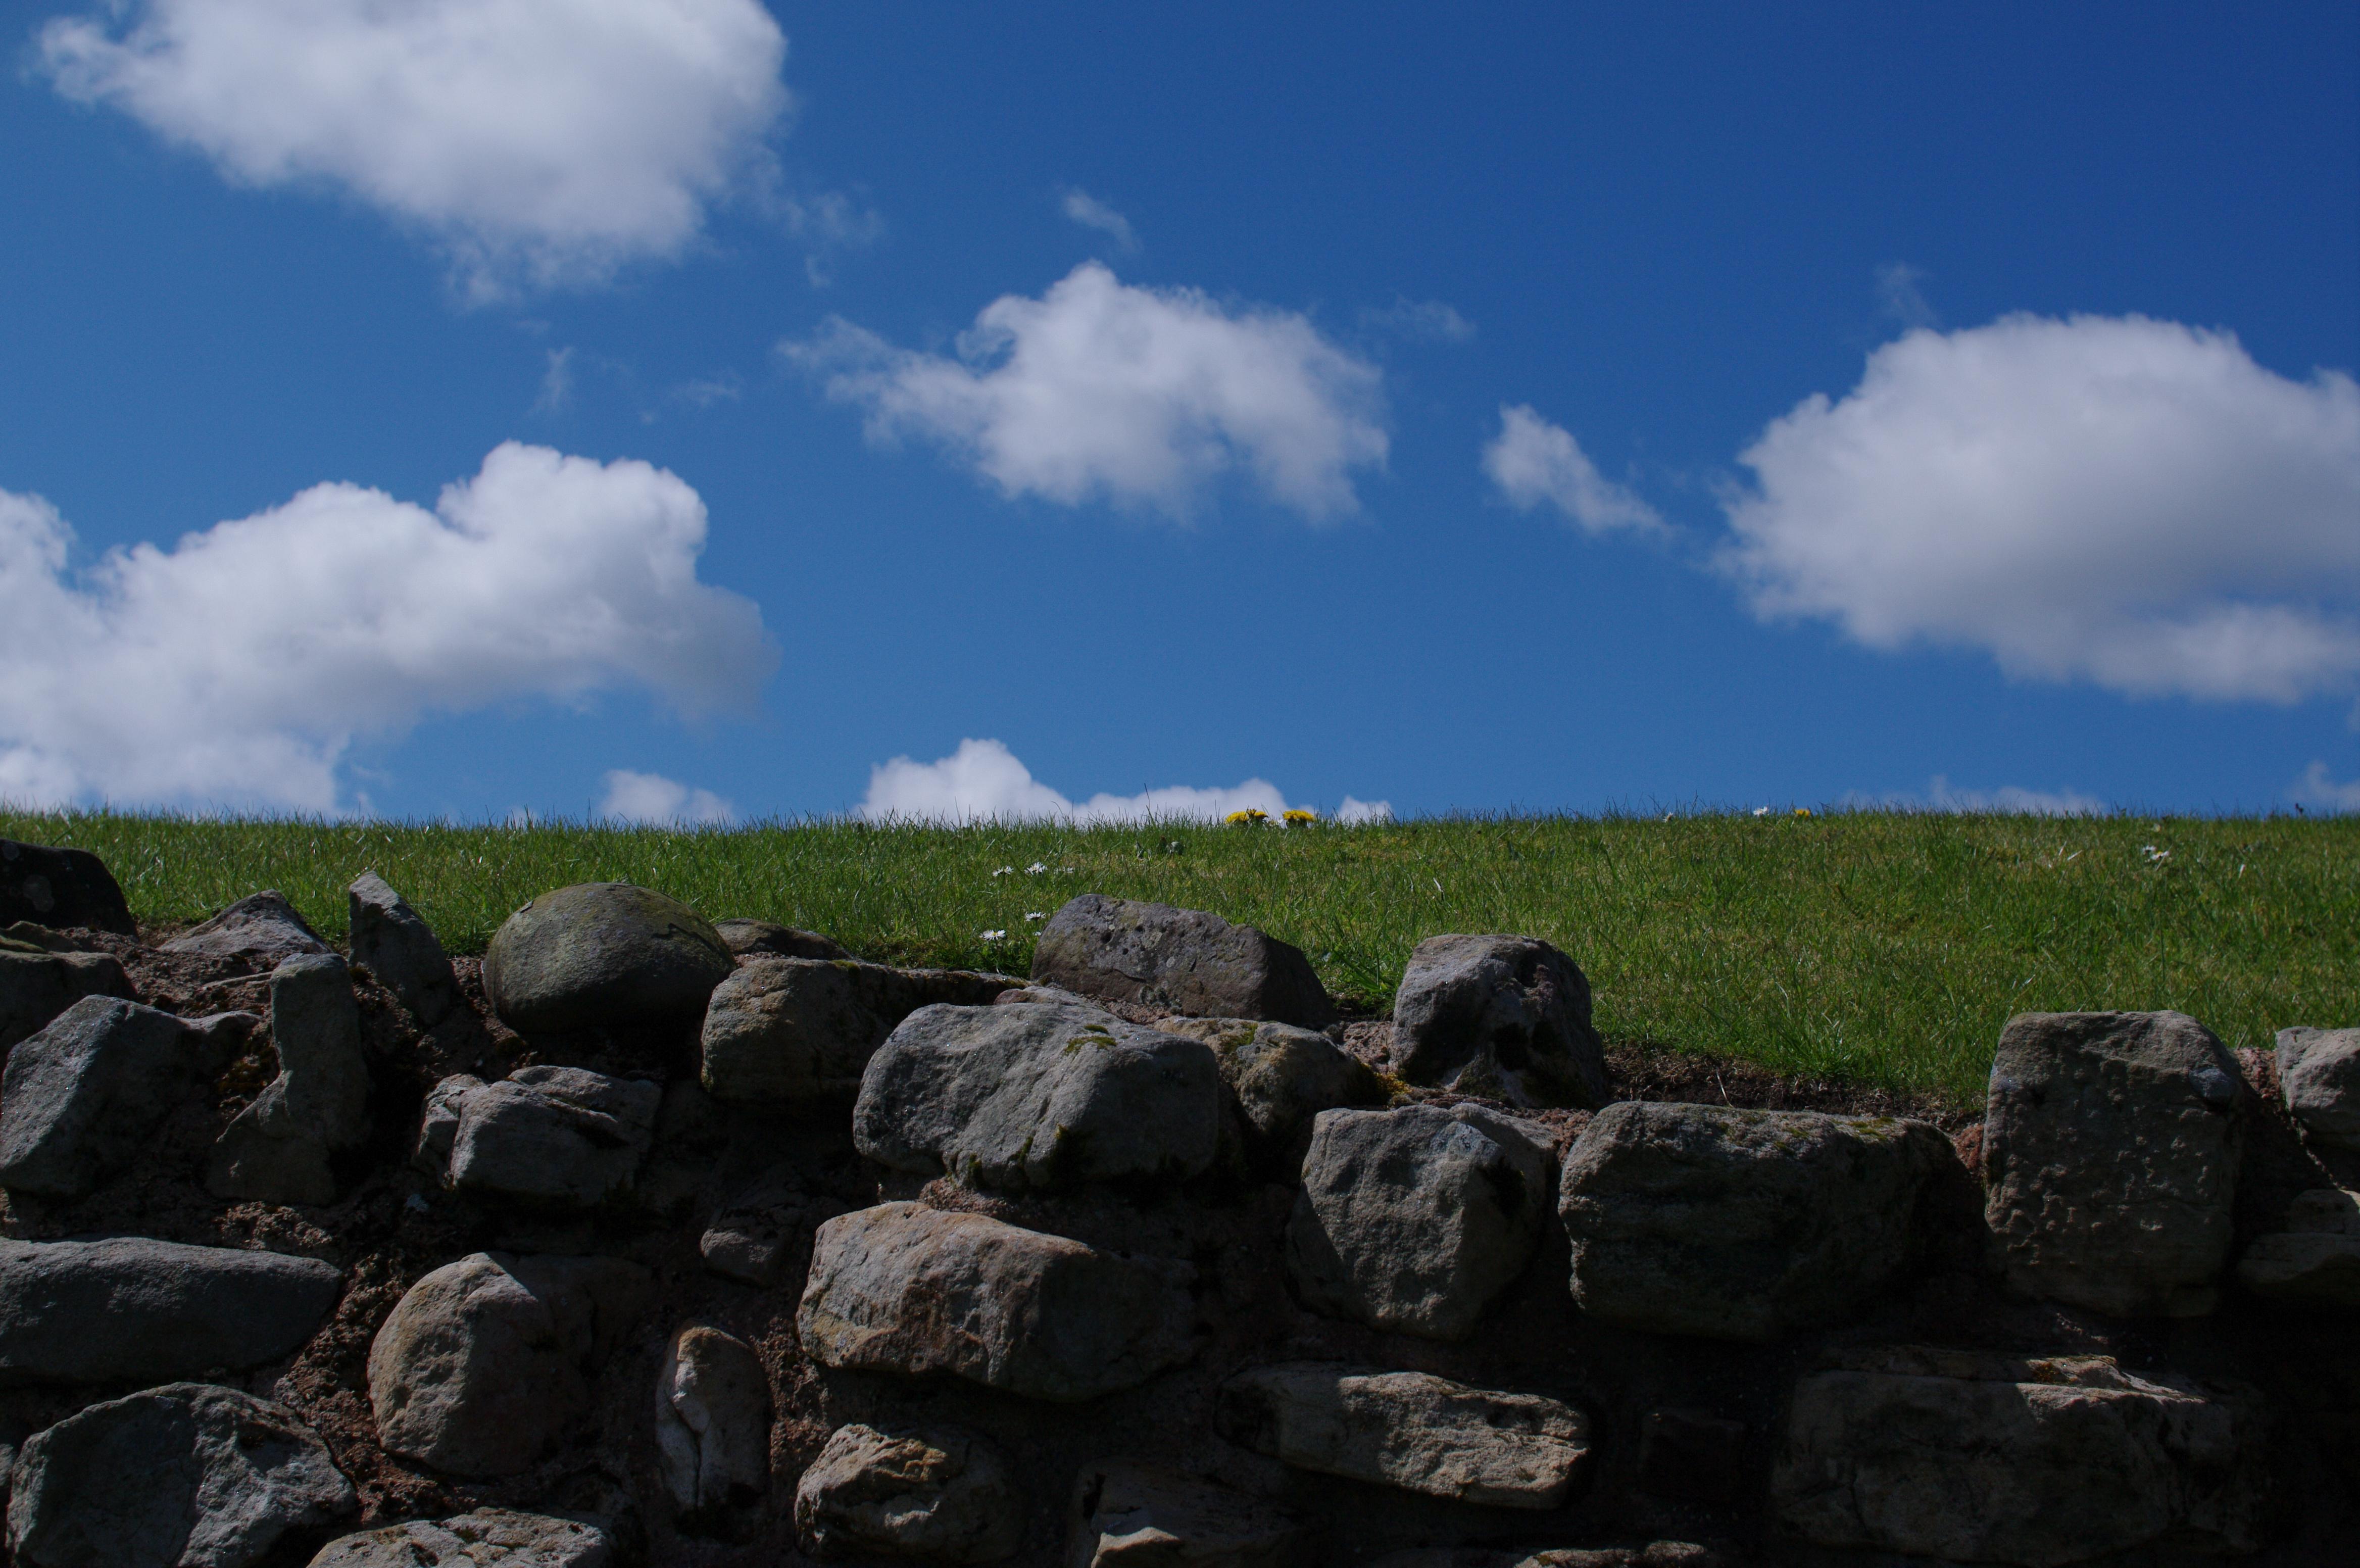 Northumberland_Skies2.jpg